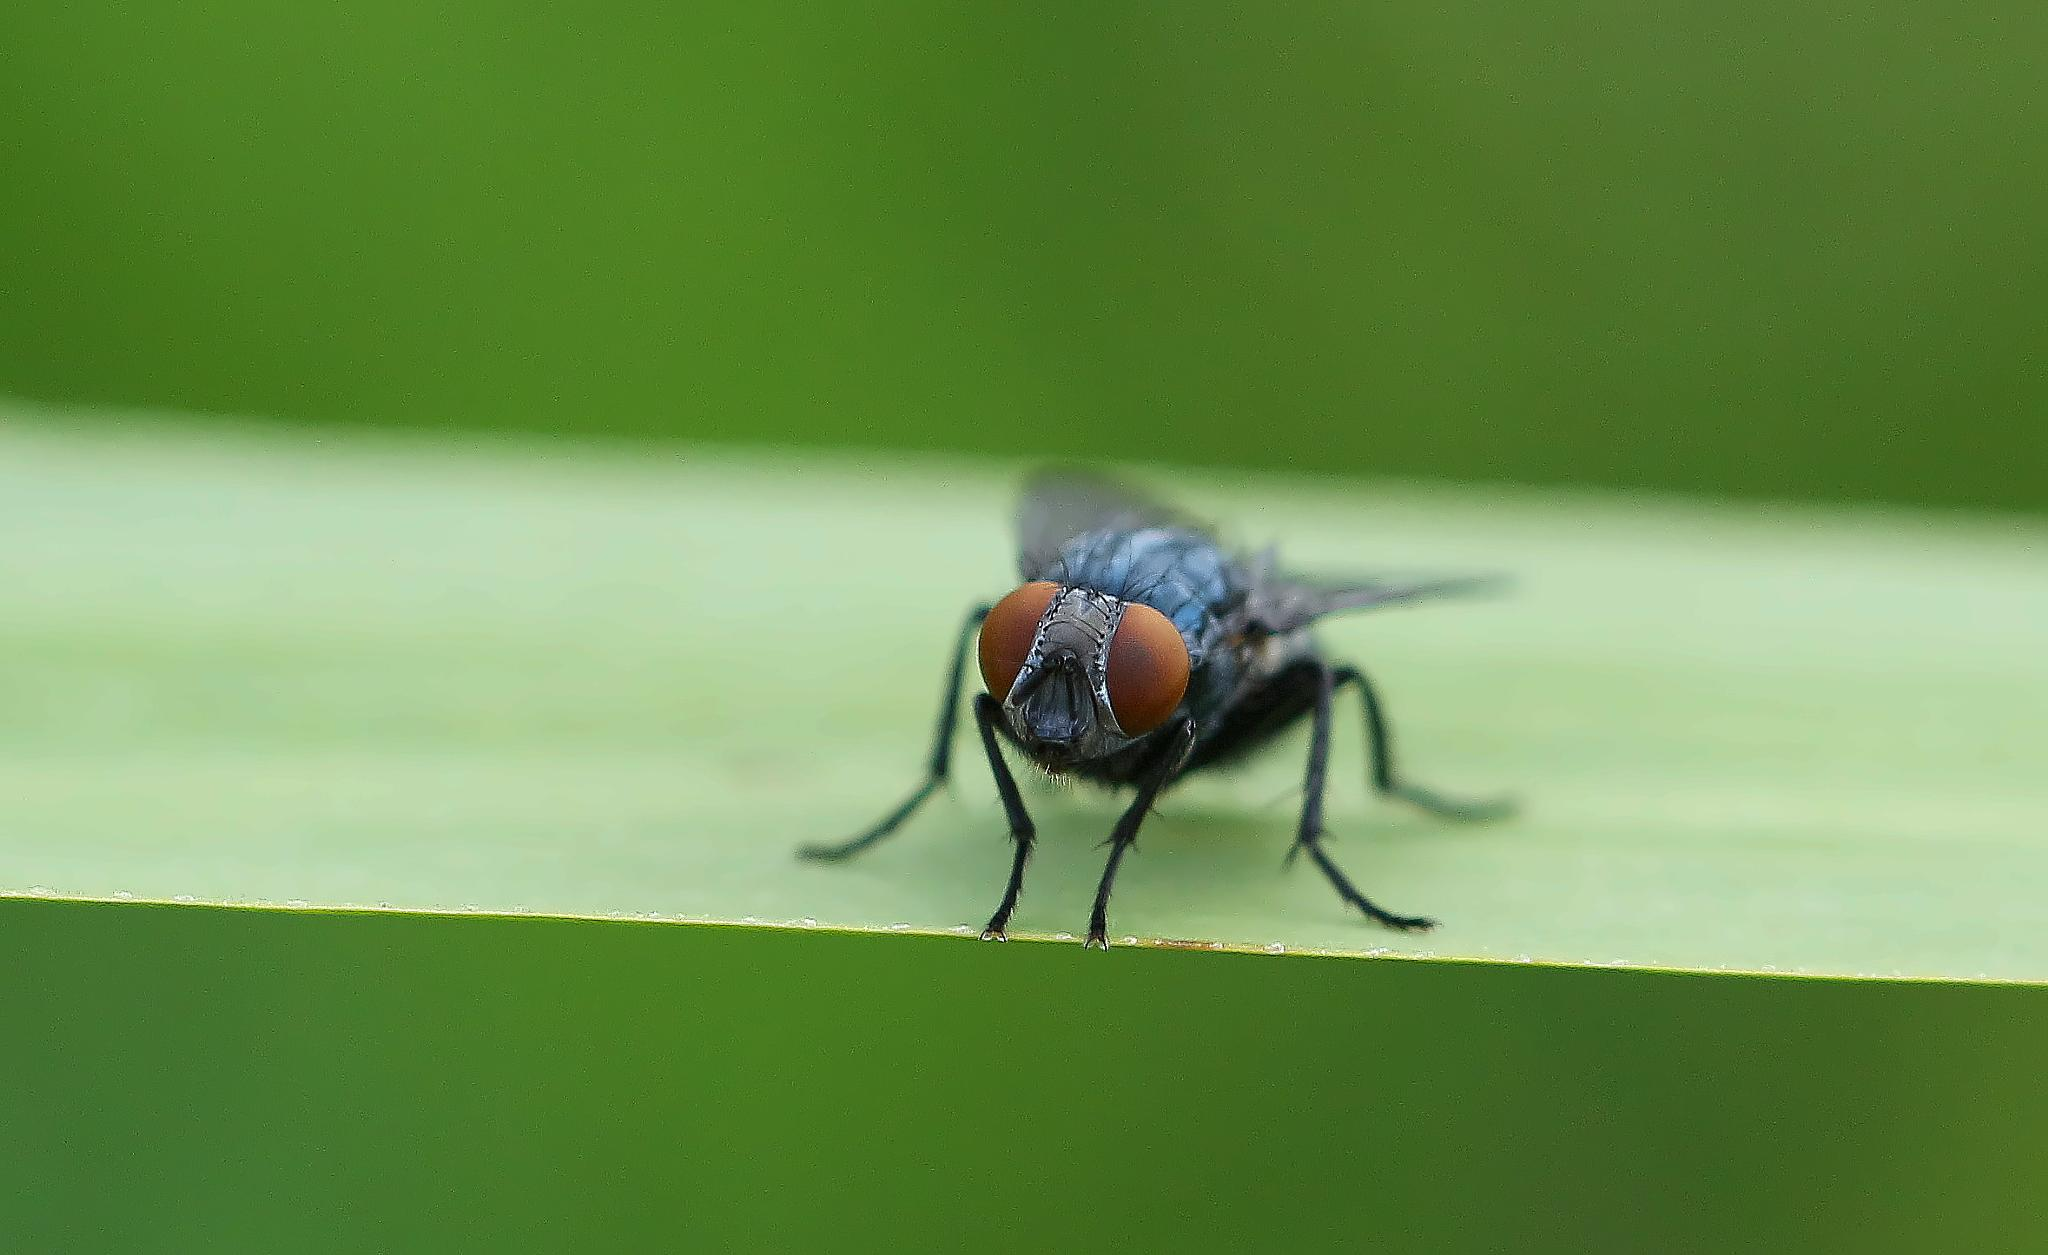 Flue. (fly) by John Friis Mortensen